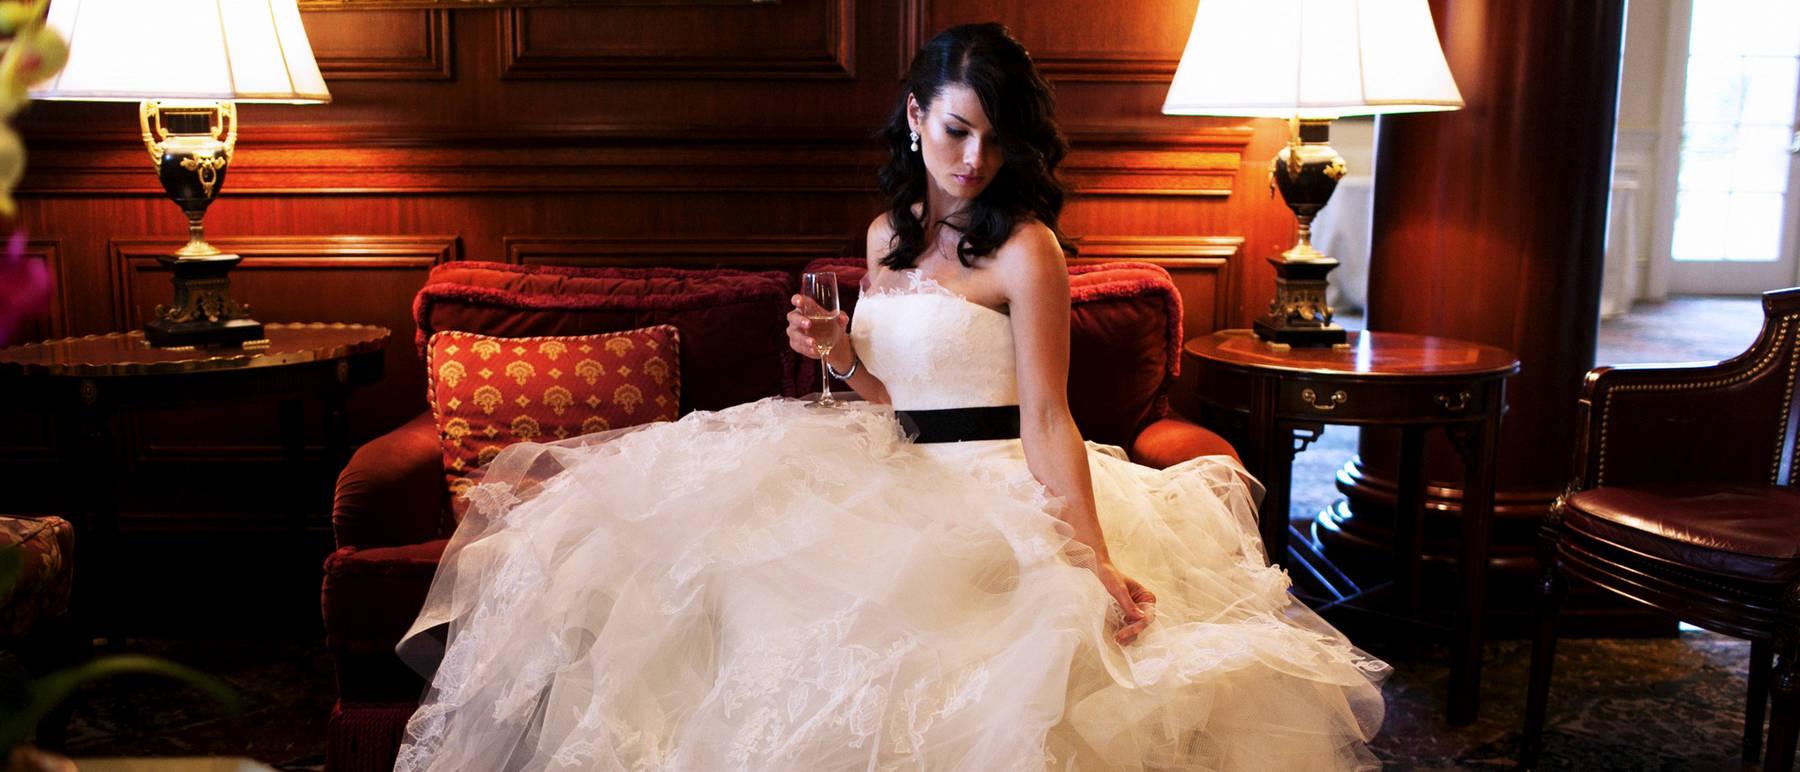 johnandjoseph-wedding-photographer-hz-slider-119